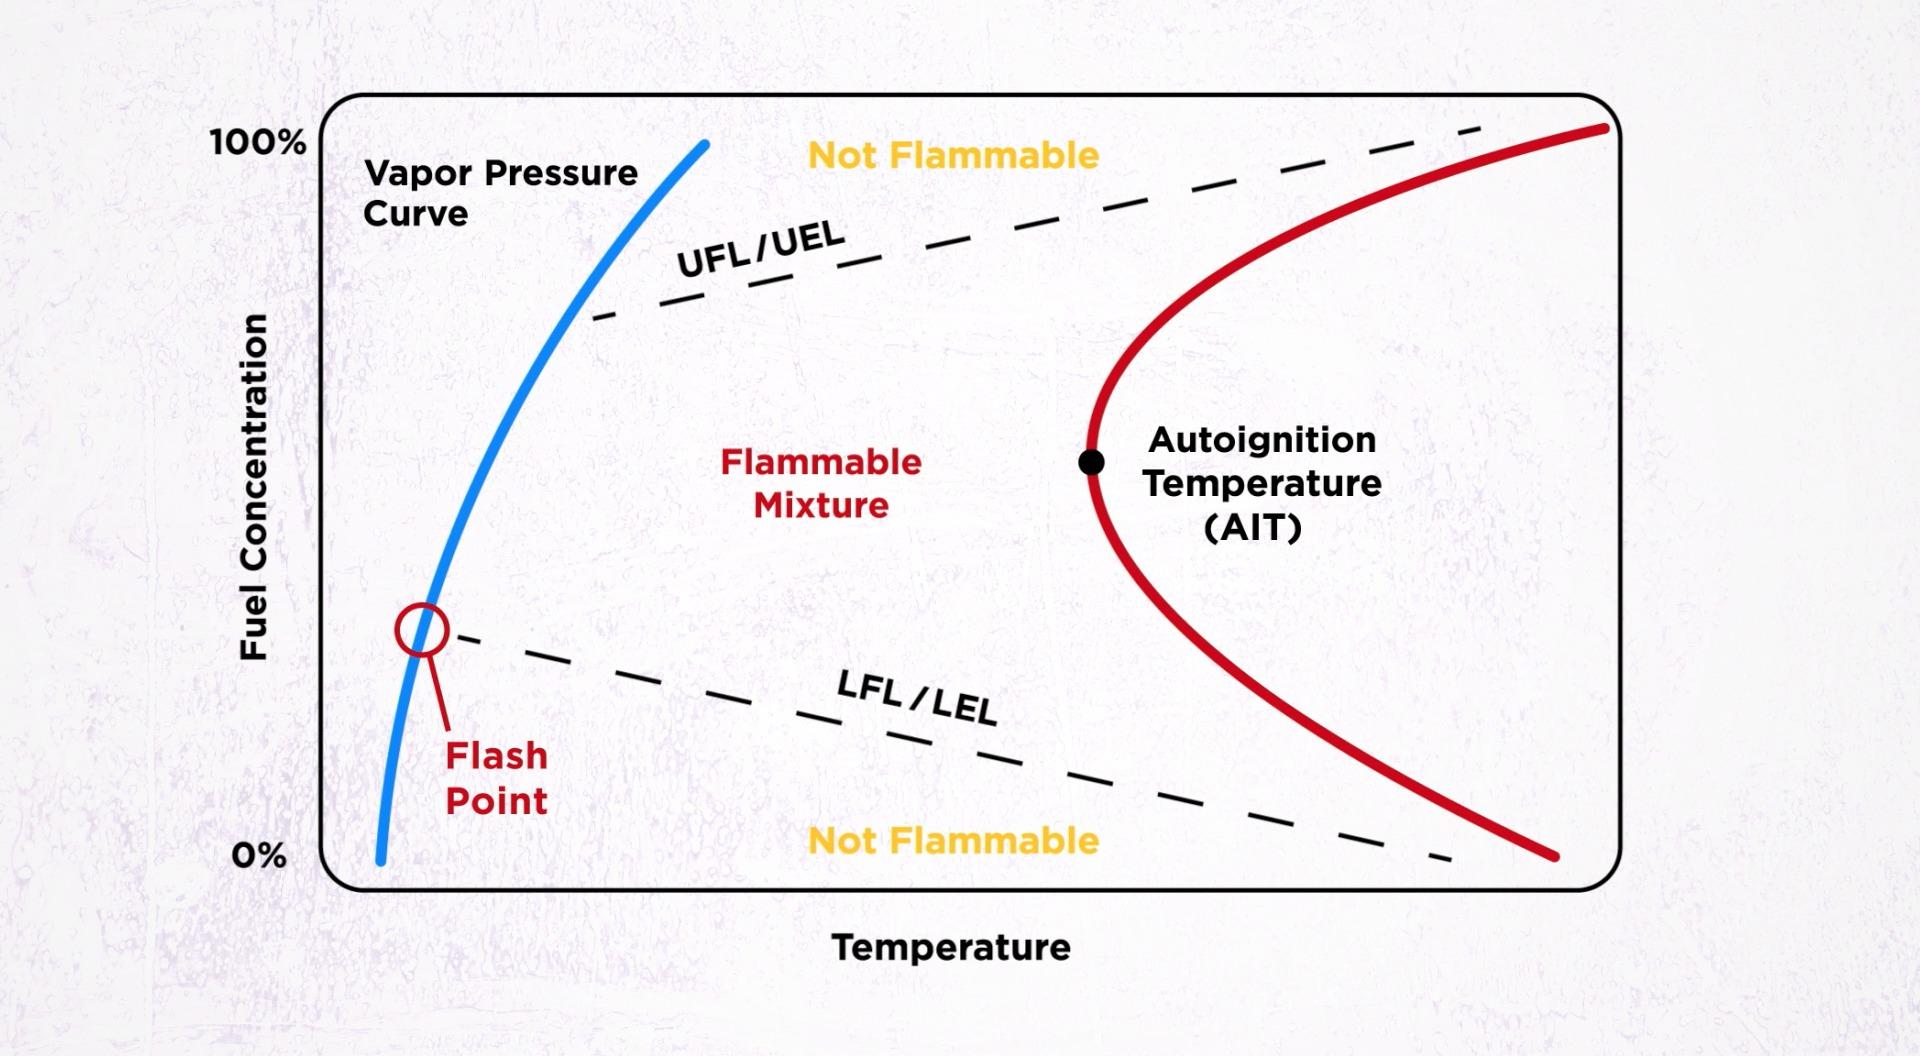 FlammabilityGraph